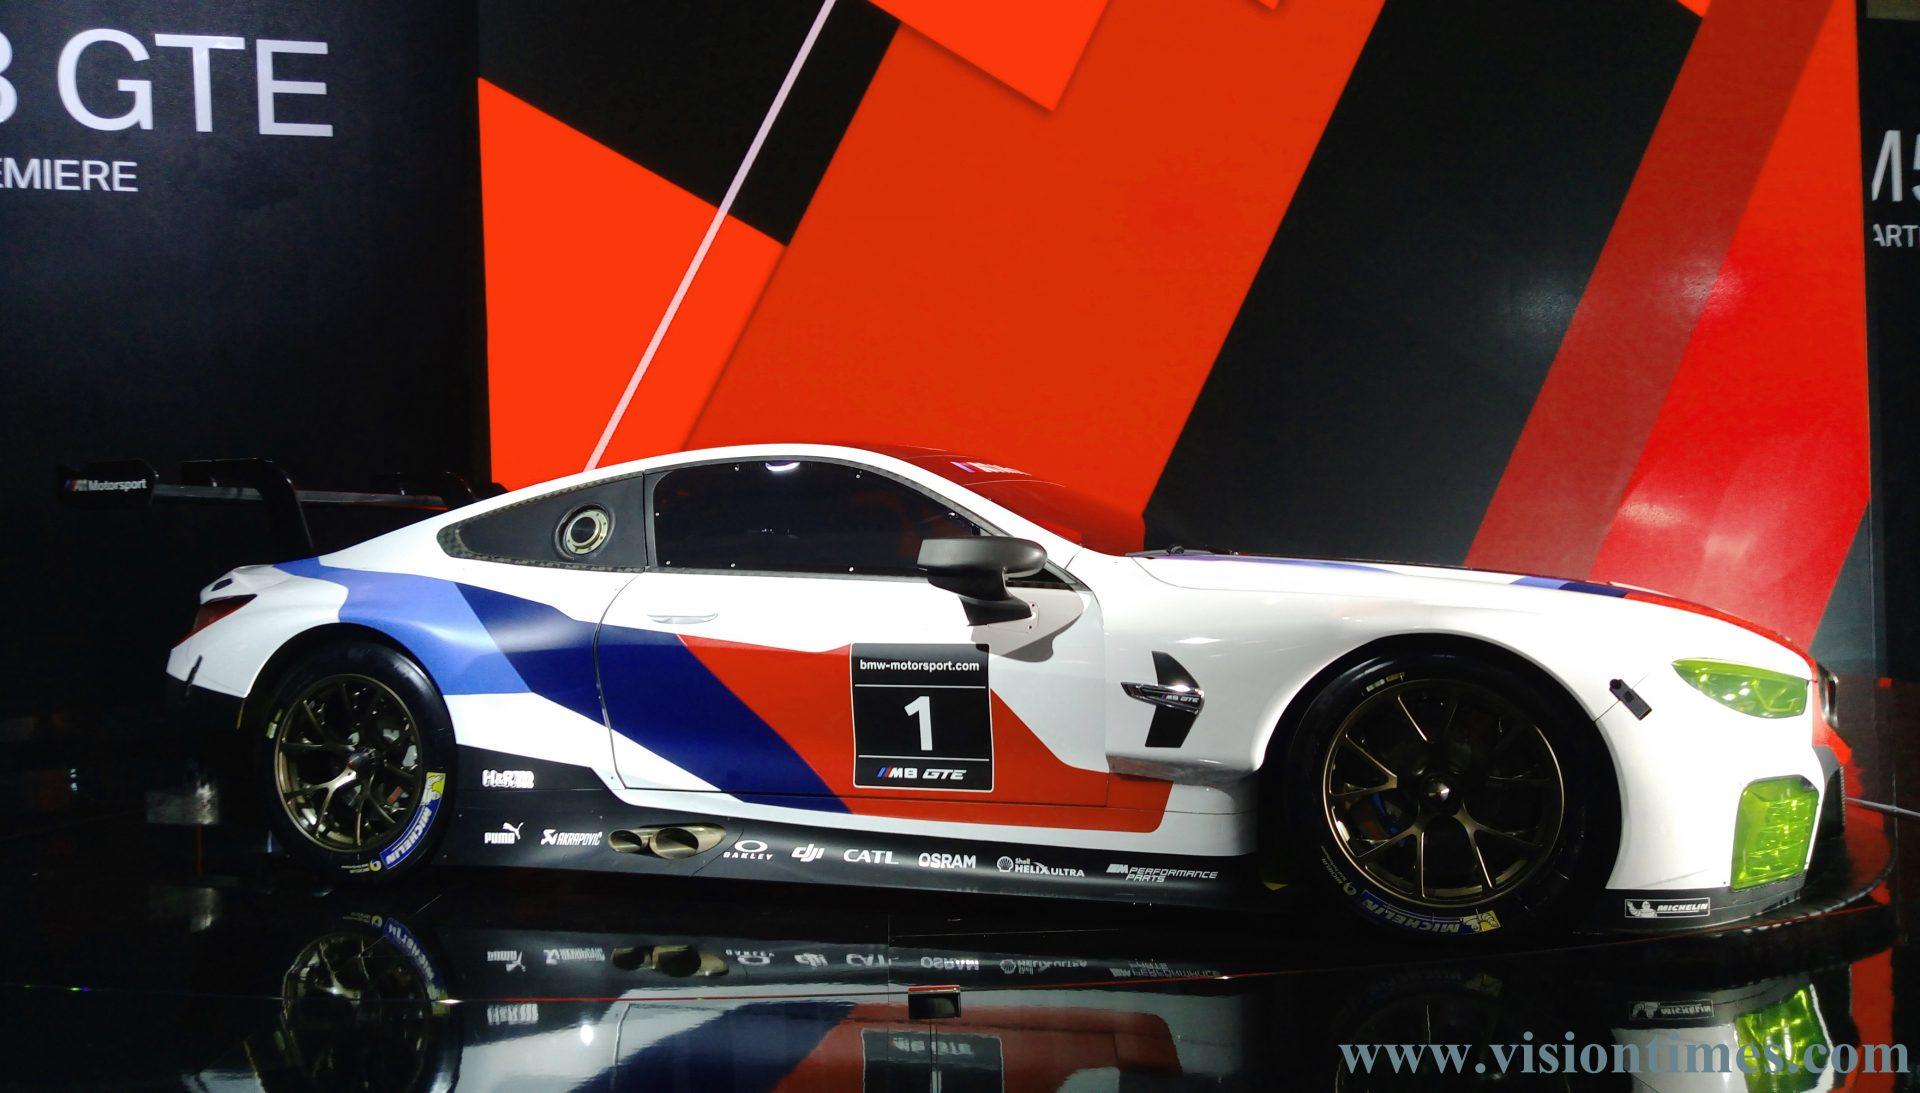 BMW M8 GTE Sport Car at the 2018 Taipei International Auto Show (Image: Billy Shyu / Vision Times)